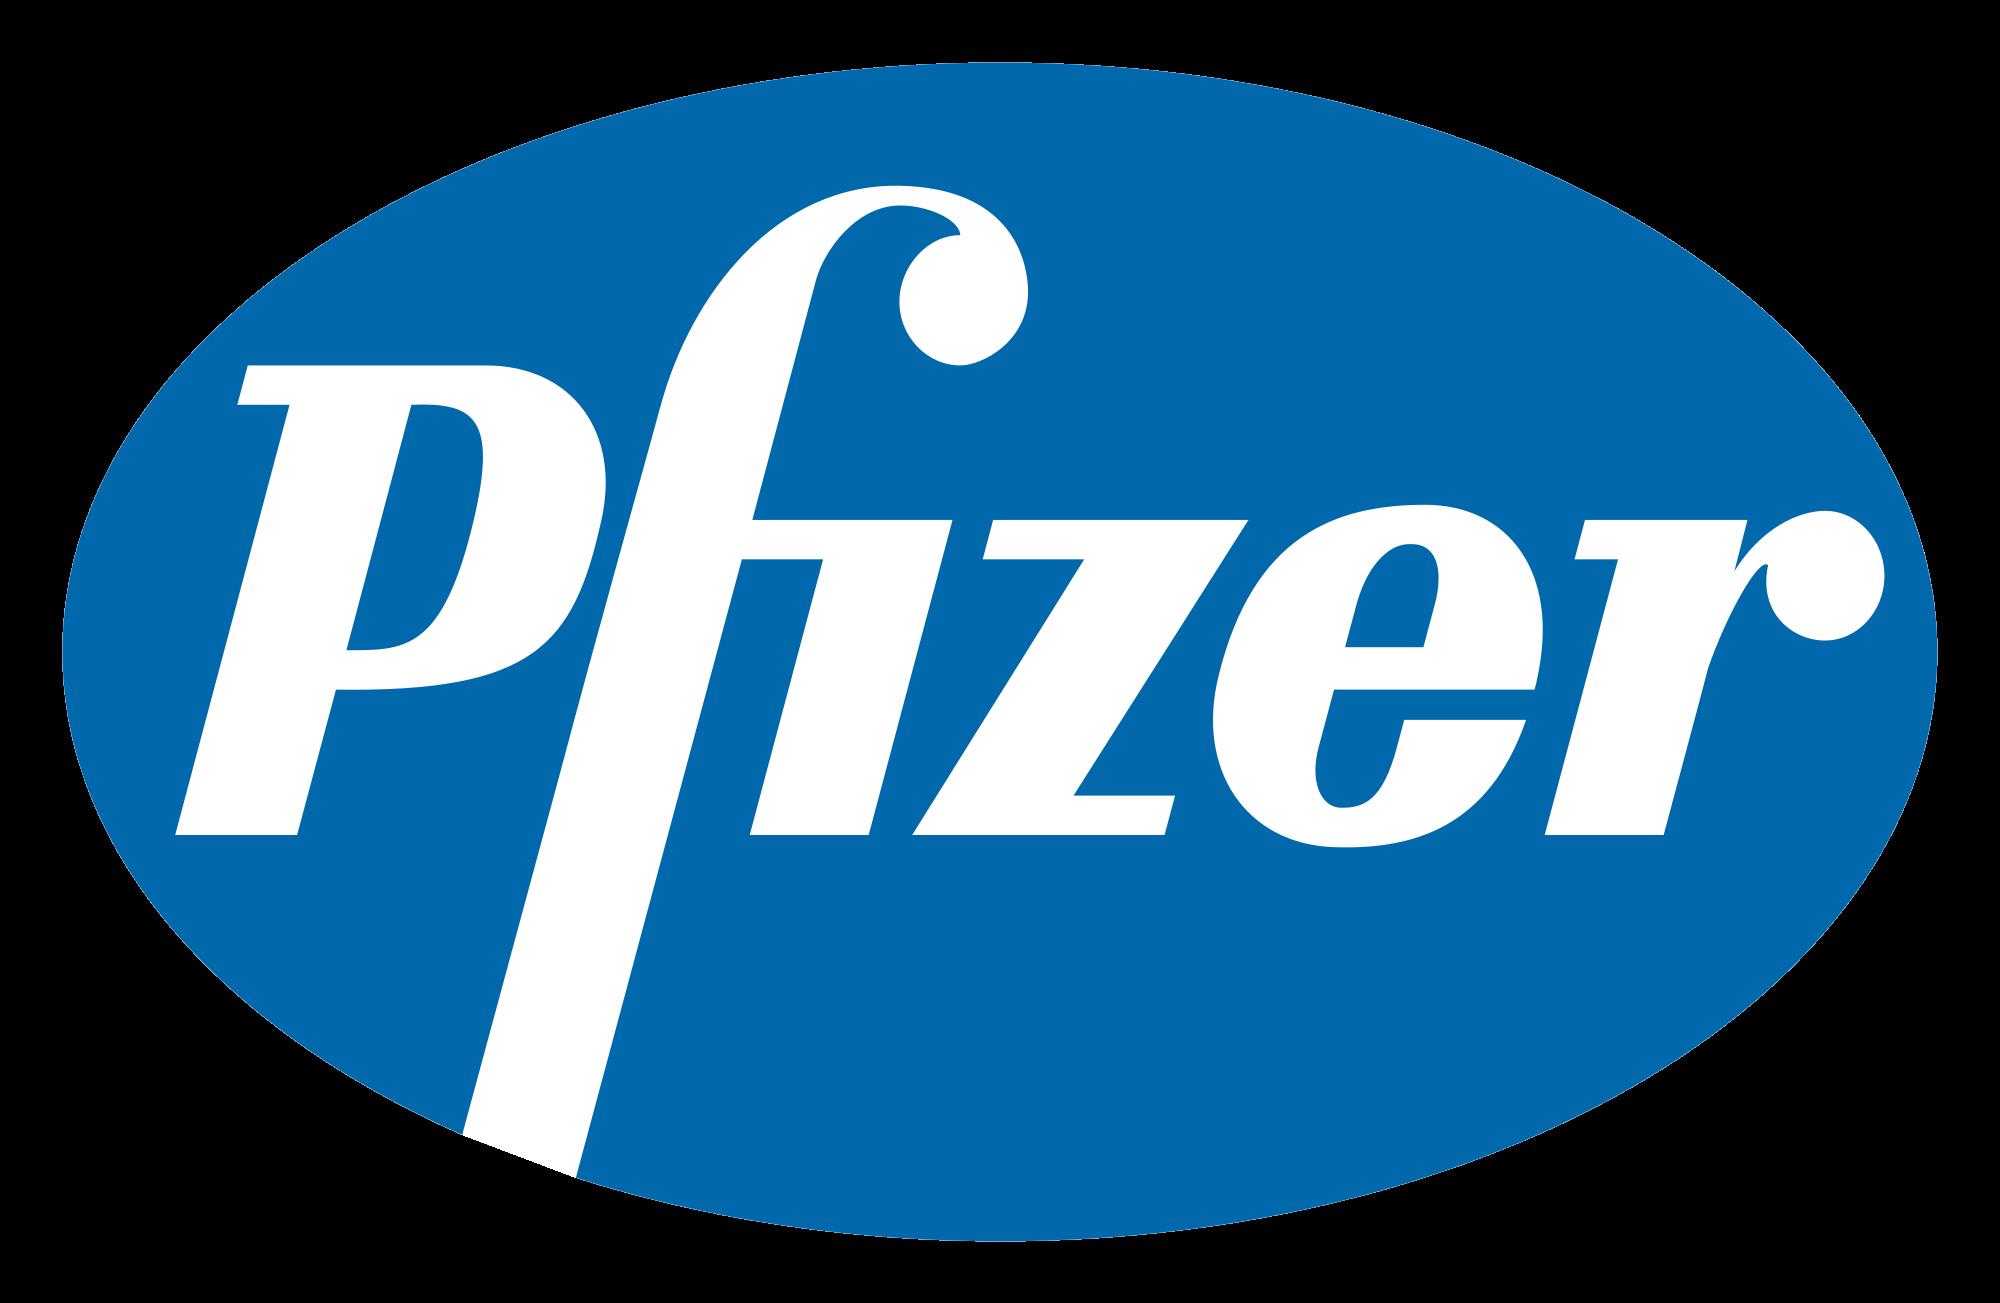 2-Pfizer.png